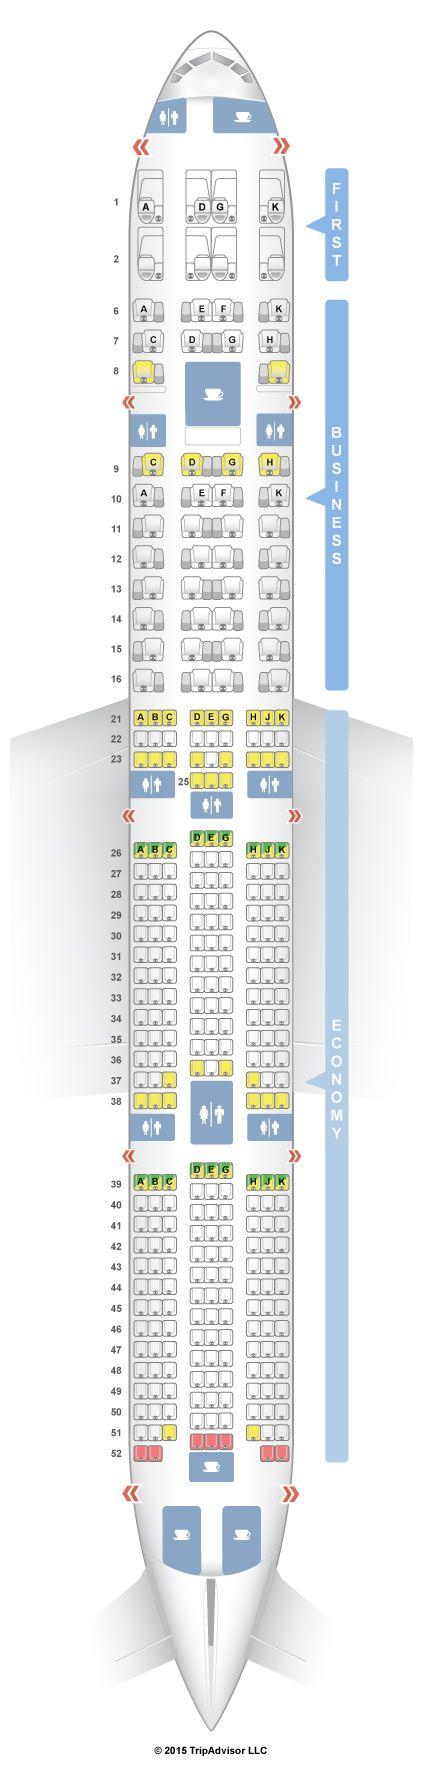 Seatguru Seat Map Garuda Indonesia Boeing 777 300er 77w